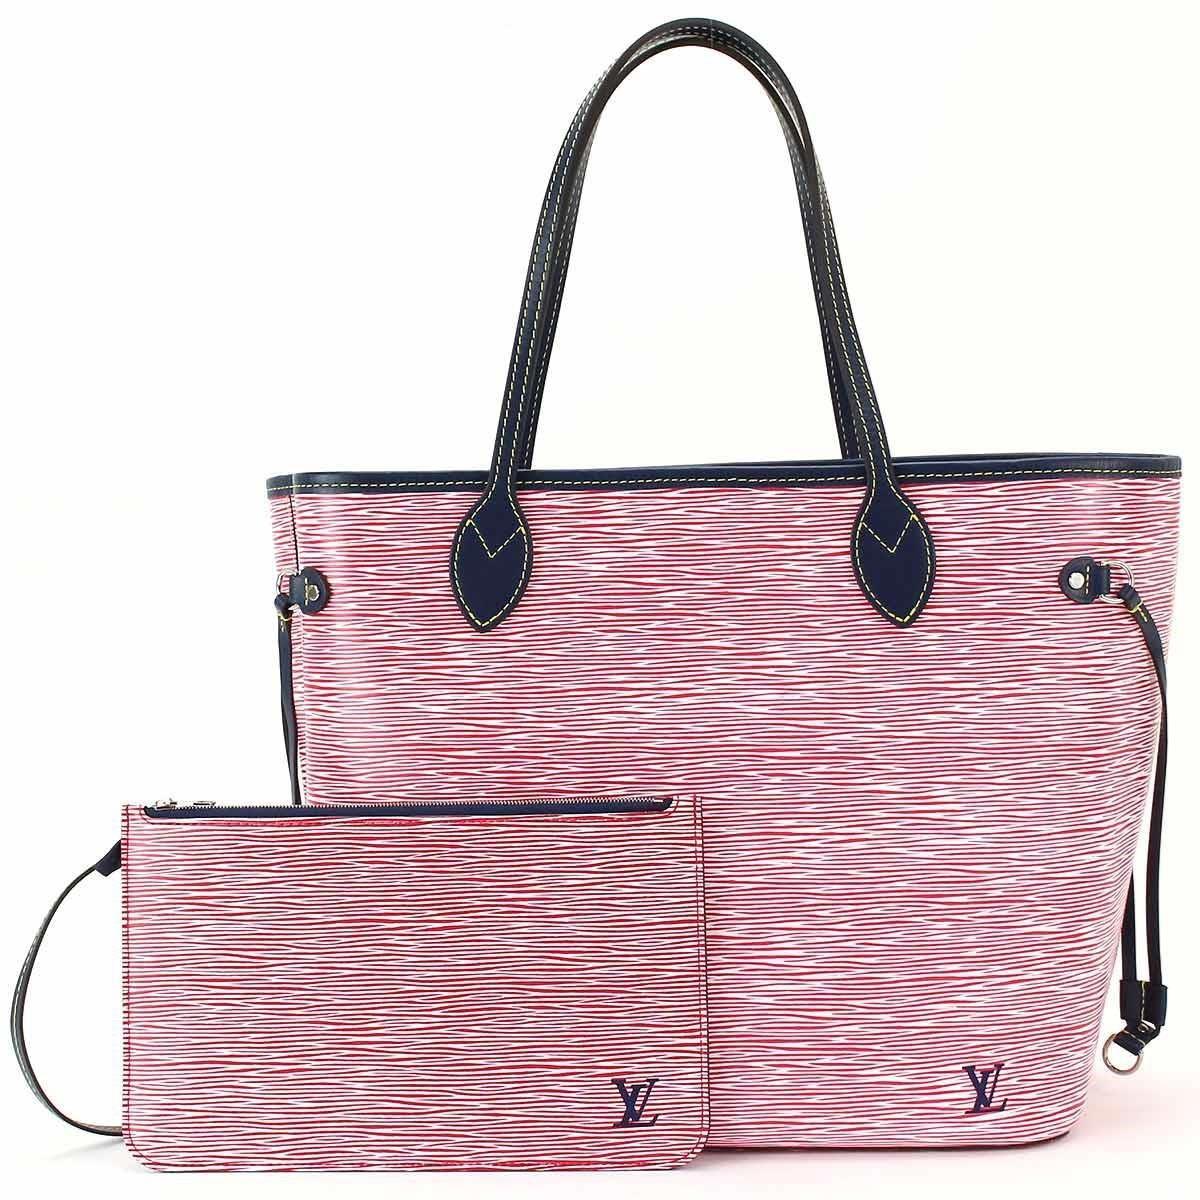 a993c024a Louis Vuitton Epi Denim Neverfull Mm Tote Bag Rouge M54546 90041096 ...